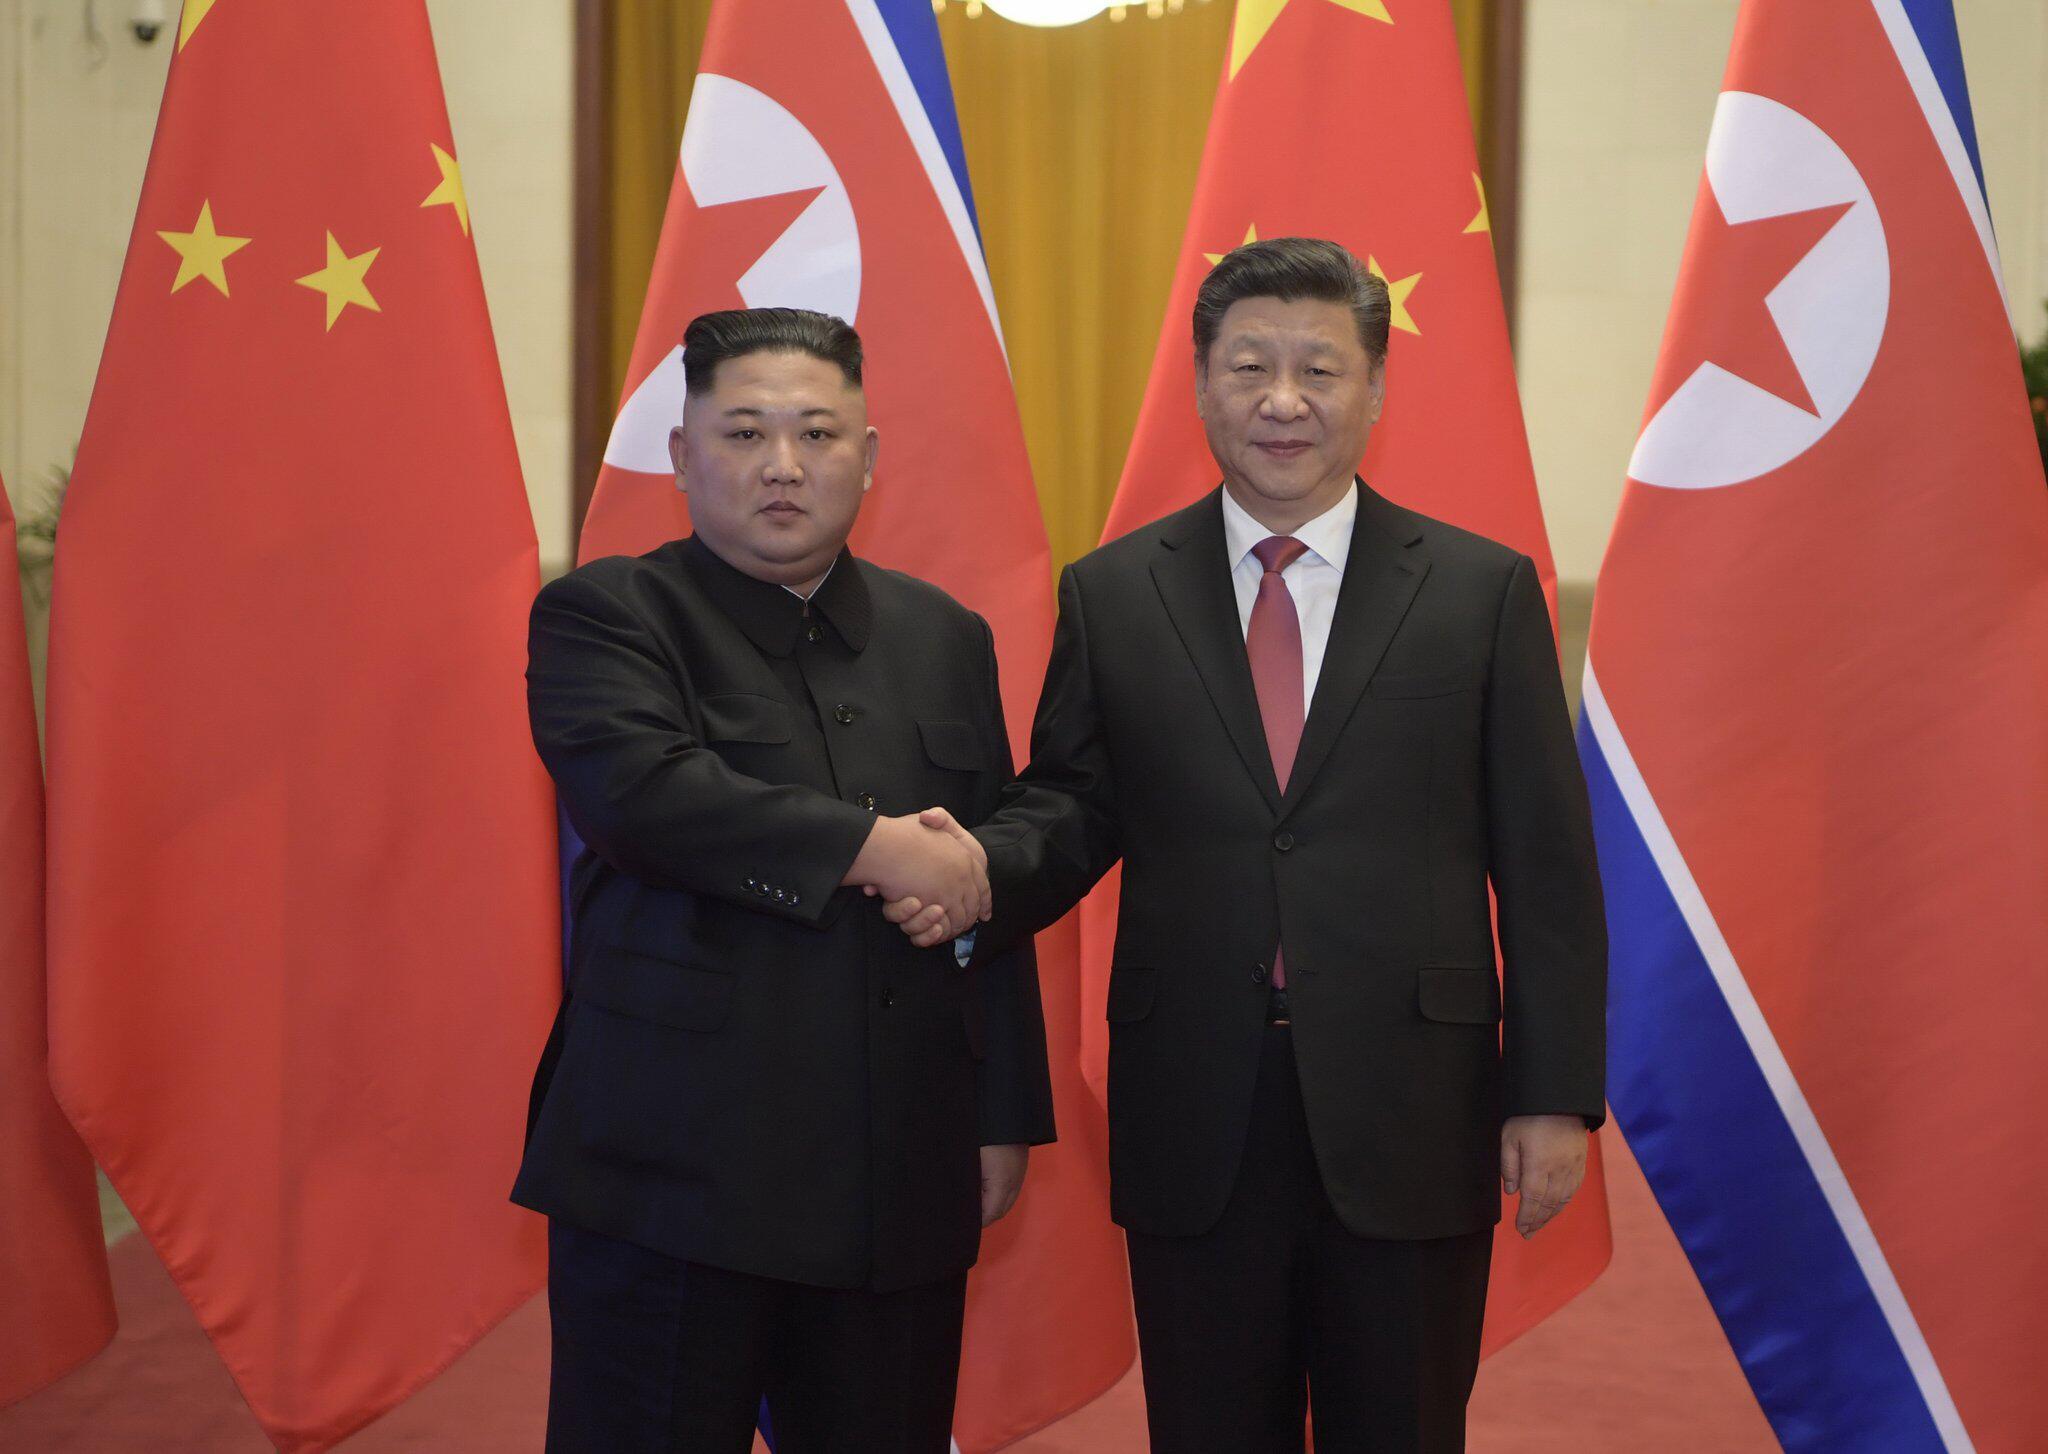 Nordkorea: Chinas Präsident Xi auf Staatsbesuch bei Diktator Kim